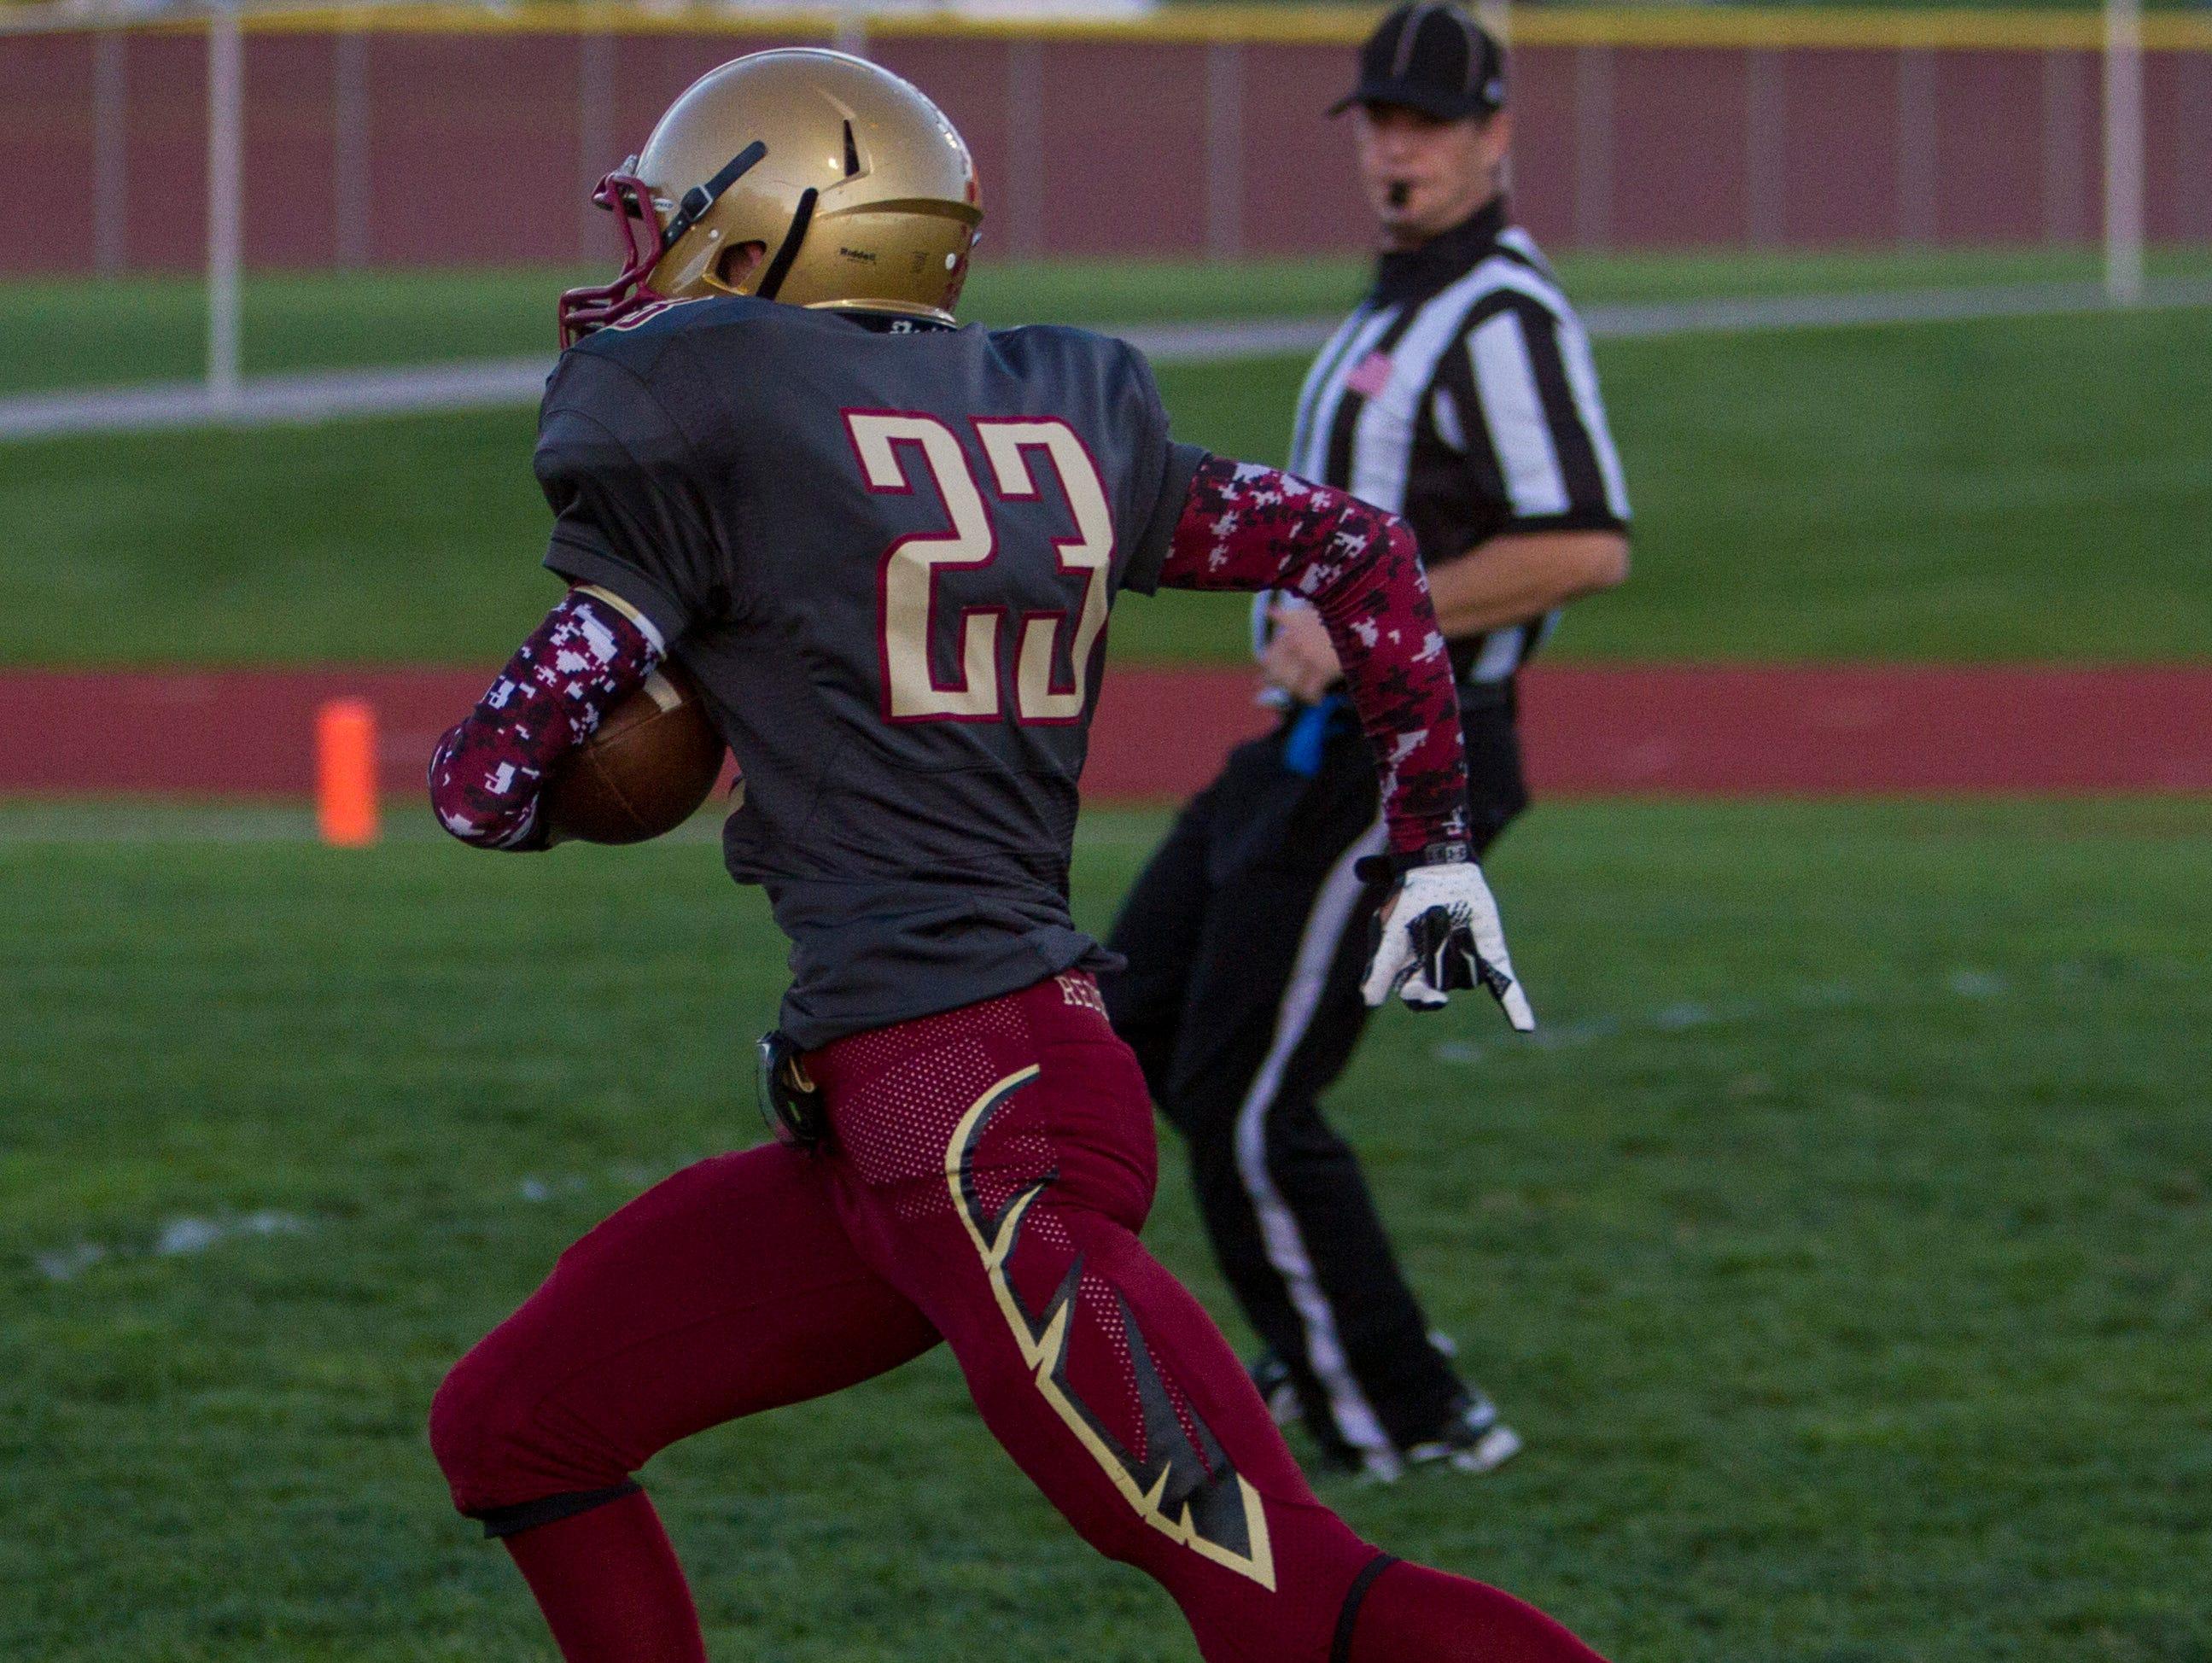 Cedar's Bracken Yardley (#23) runs for a touchdown against Snow Canyon, Friday, Sept. 25, 2015.